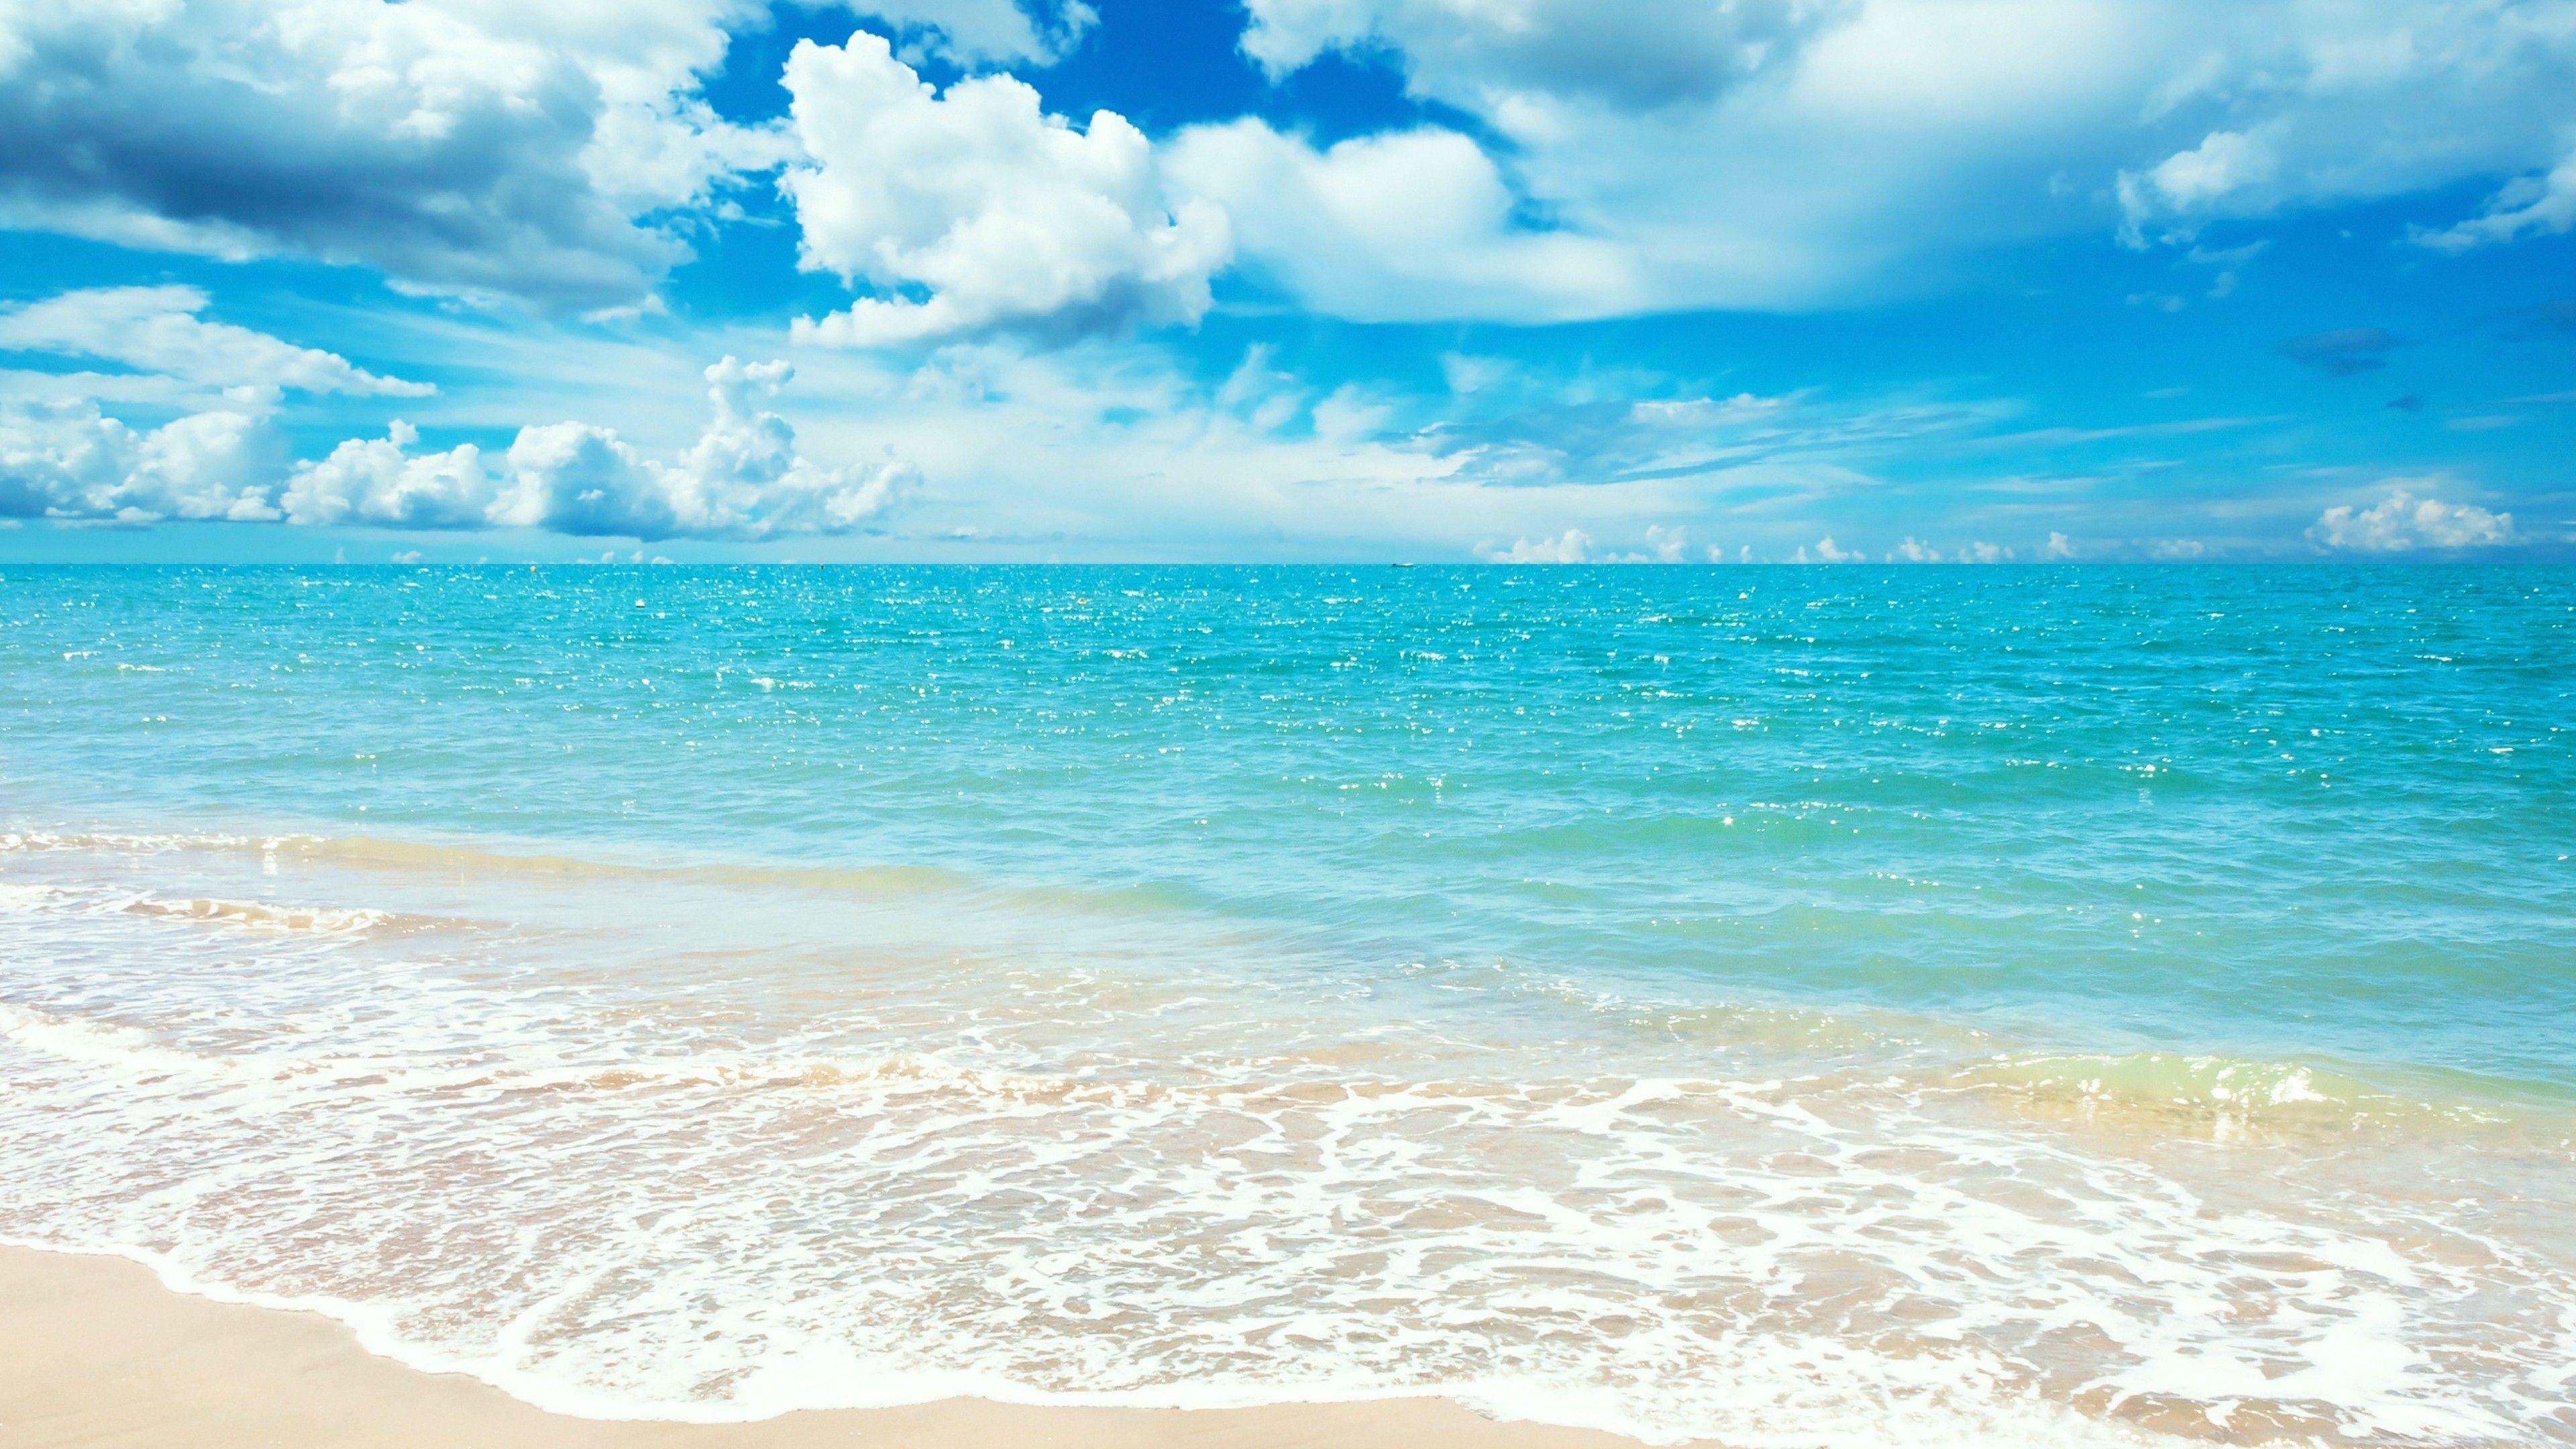 Blue Sky Beach Wallpapers Top Free Blue Sky Beach Backgrounds Wallpaperaccess